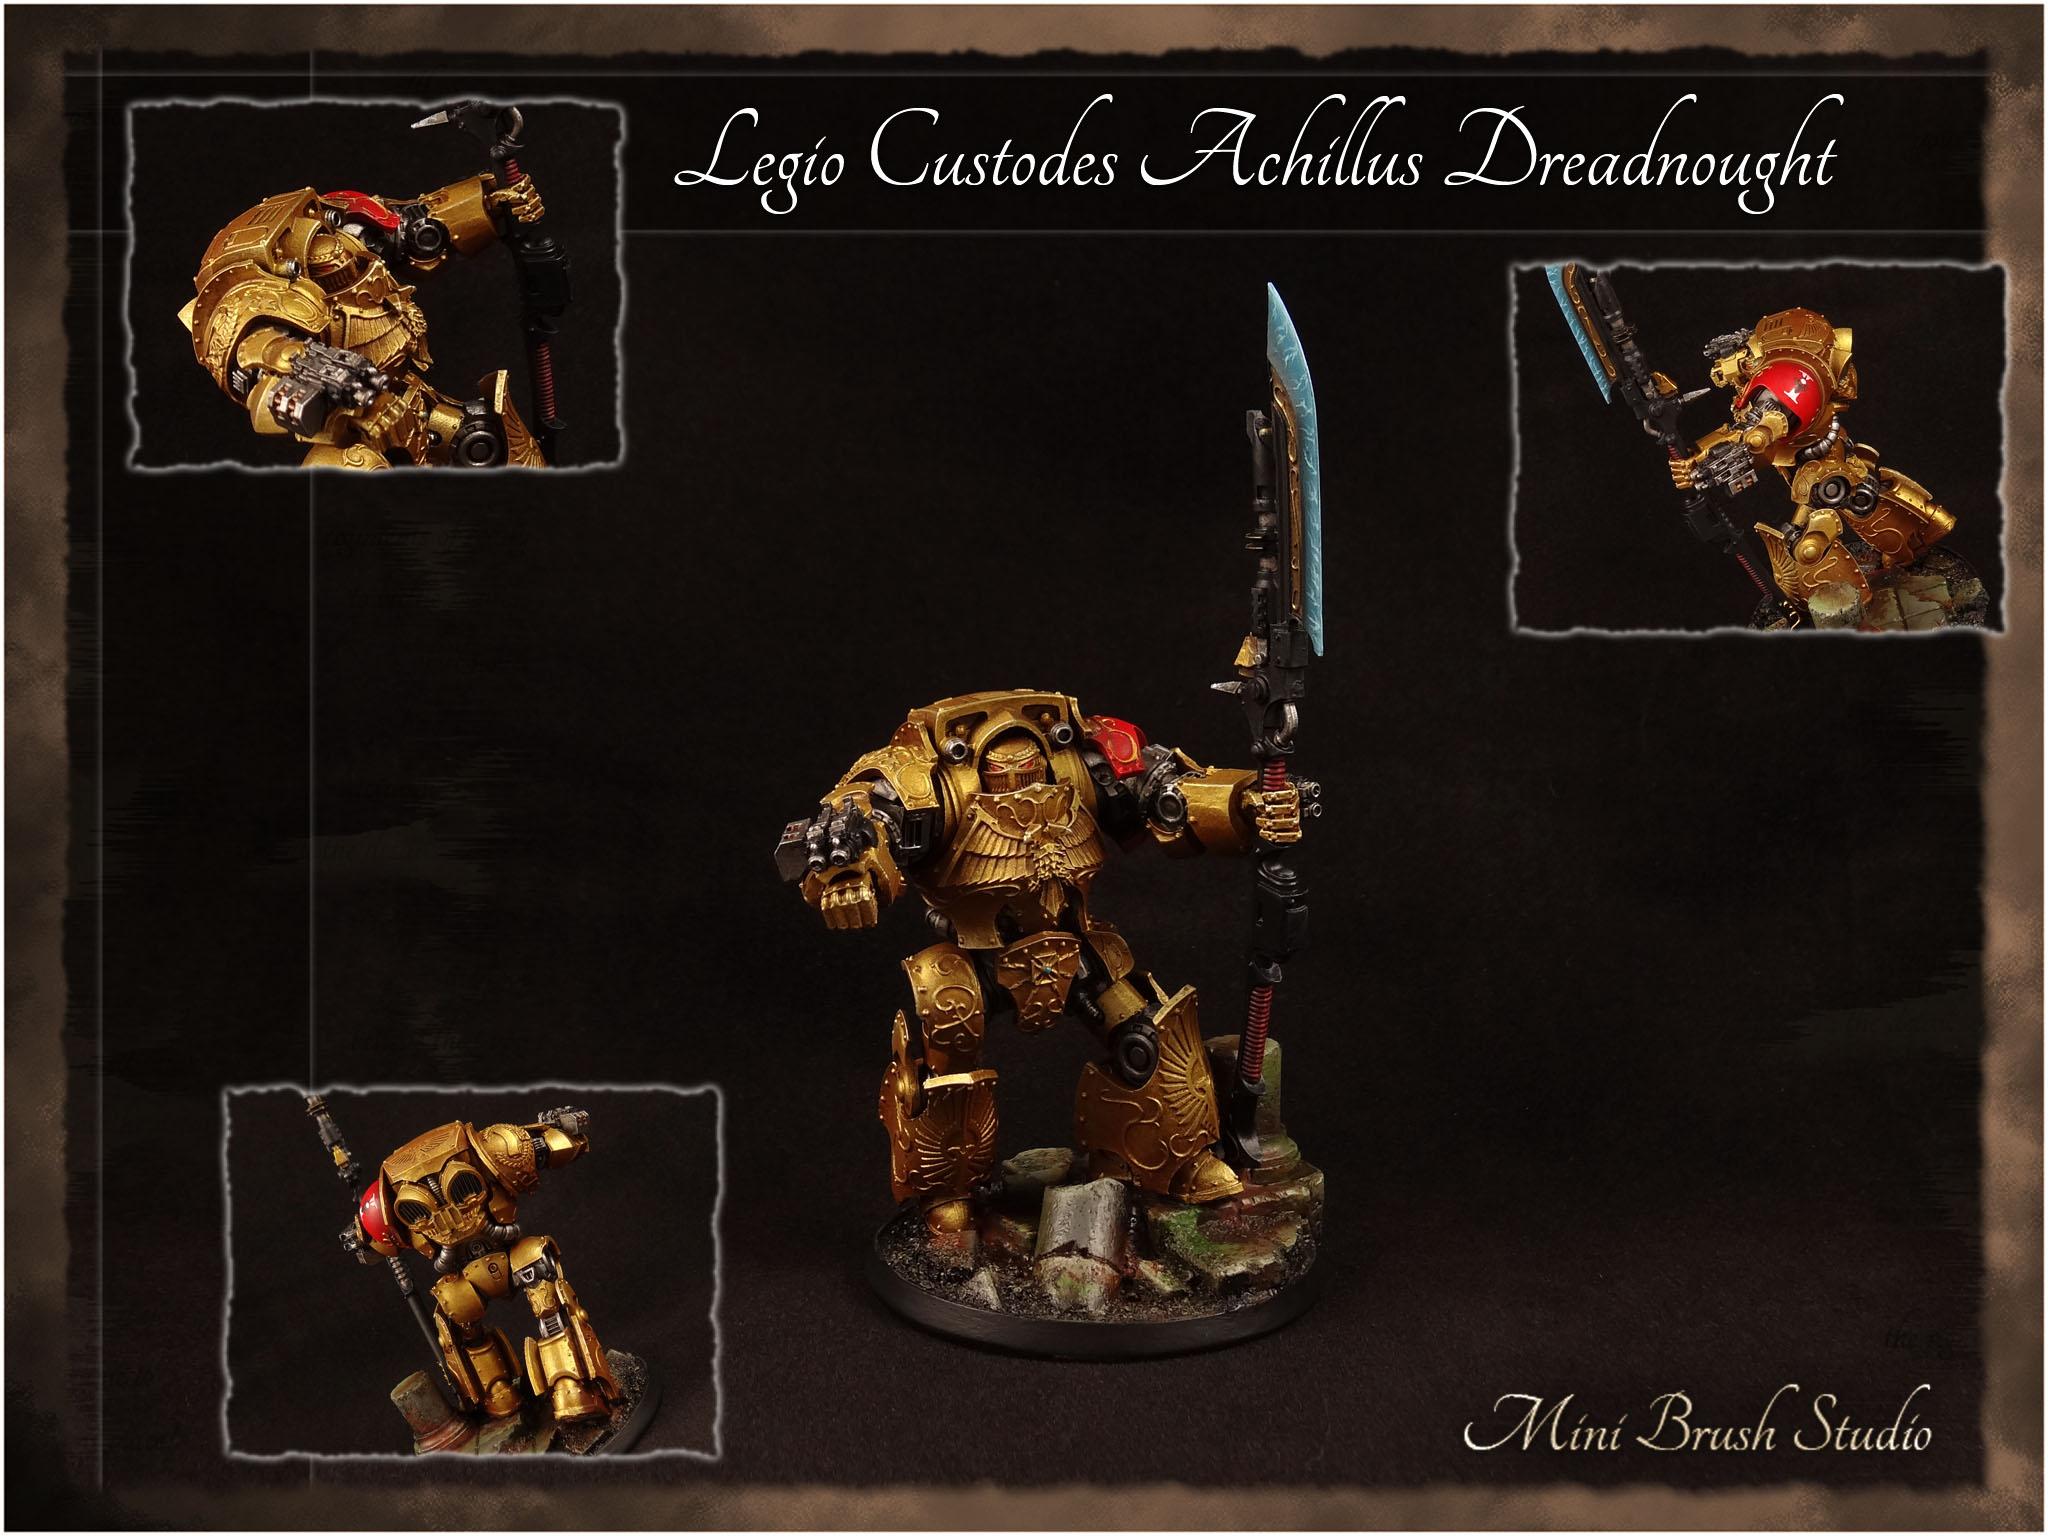 Legio Custodes Contemptor-Achillus Dreadnought 1 v7.00.jpg